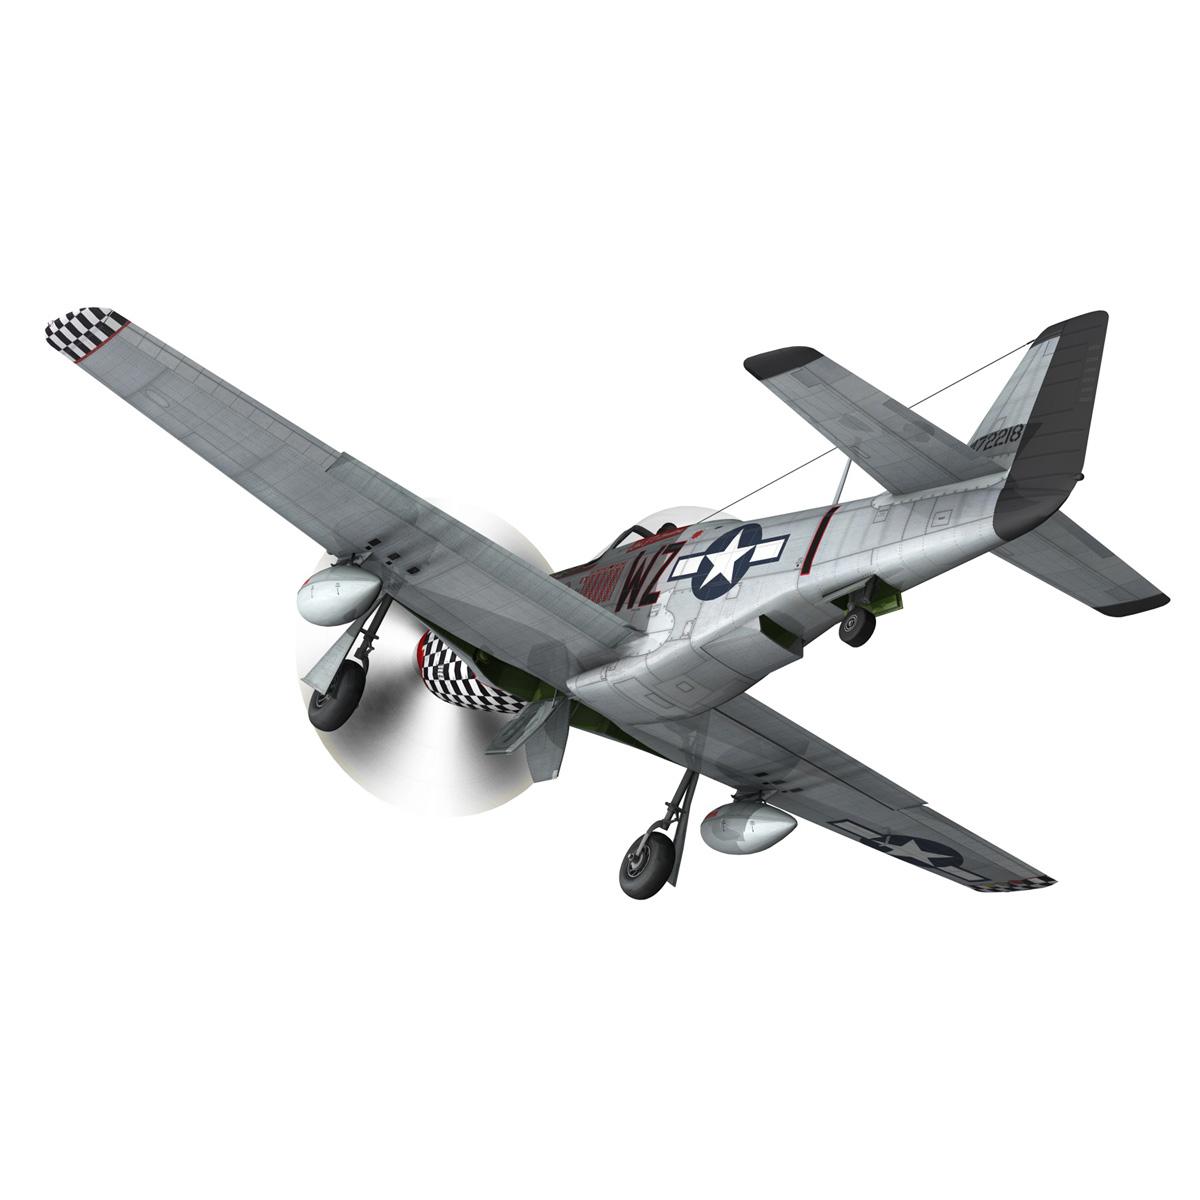 north american p-51d mustang – big beautiful doll 3d model fbx c4d lwo obj 282560